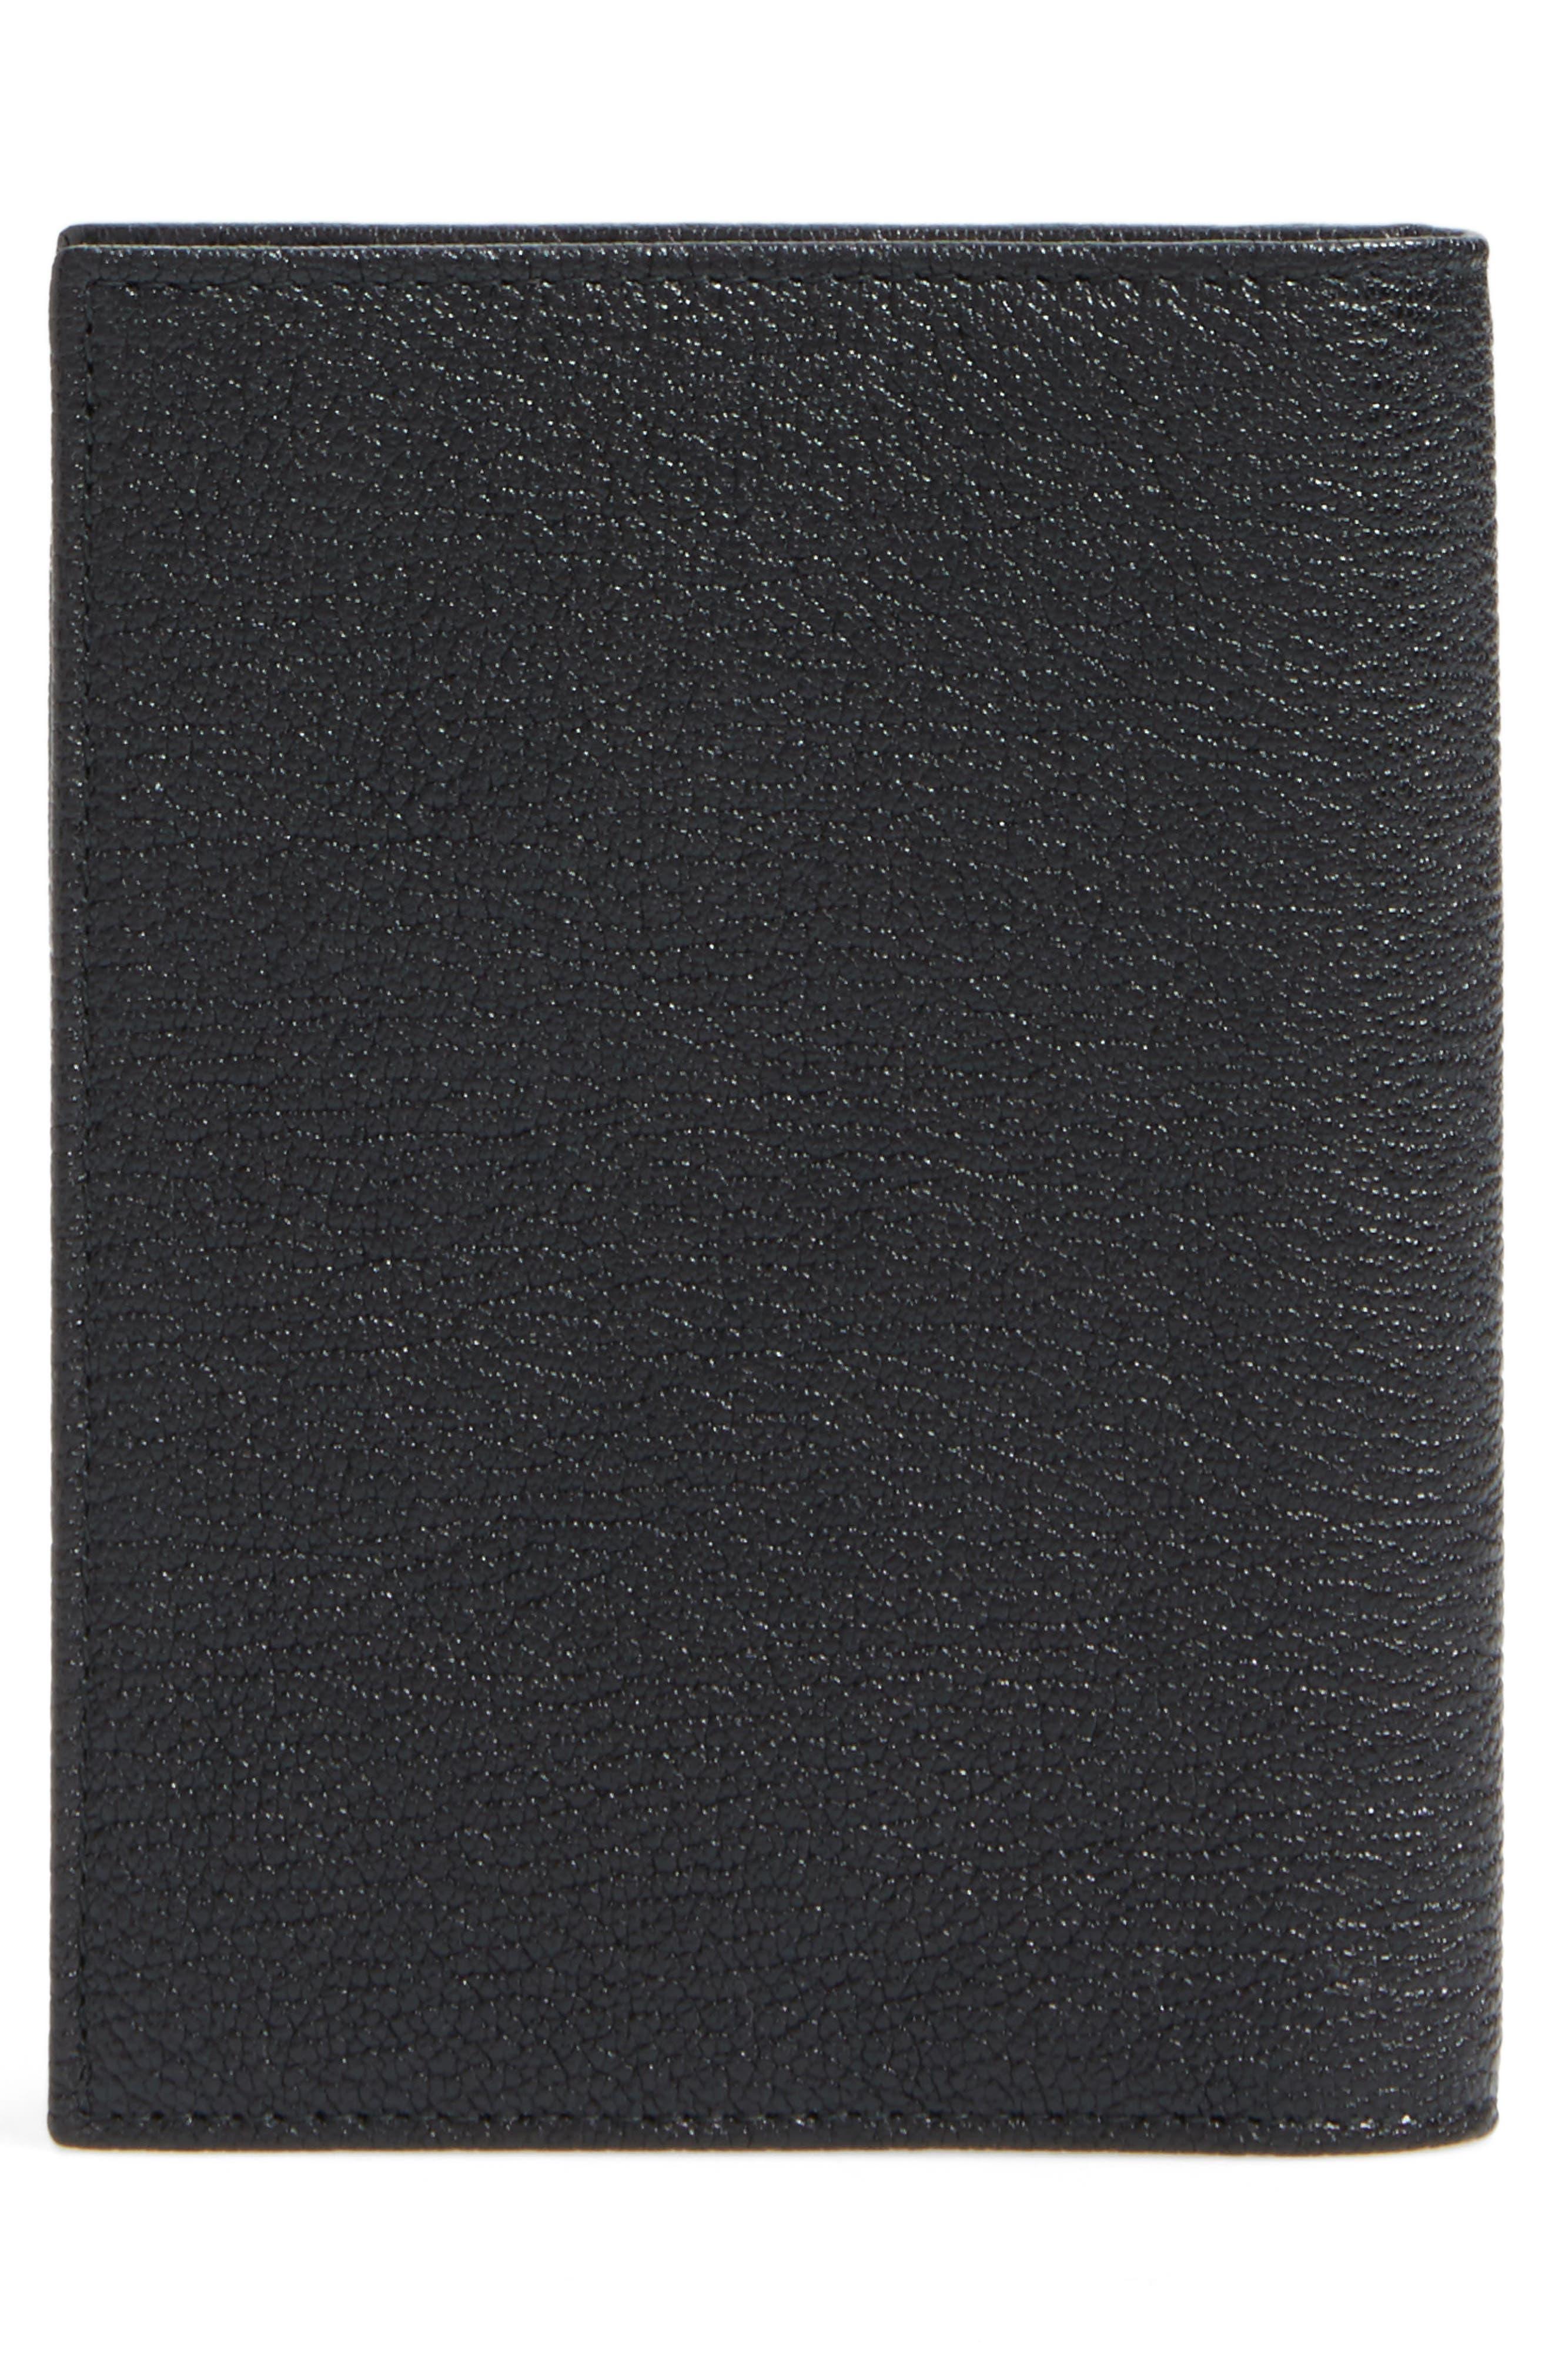 Leather Passport Case,                             Alternate thumbnail 4, color,                             001